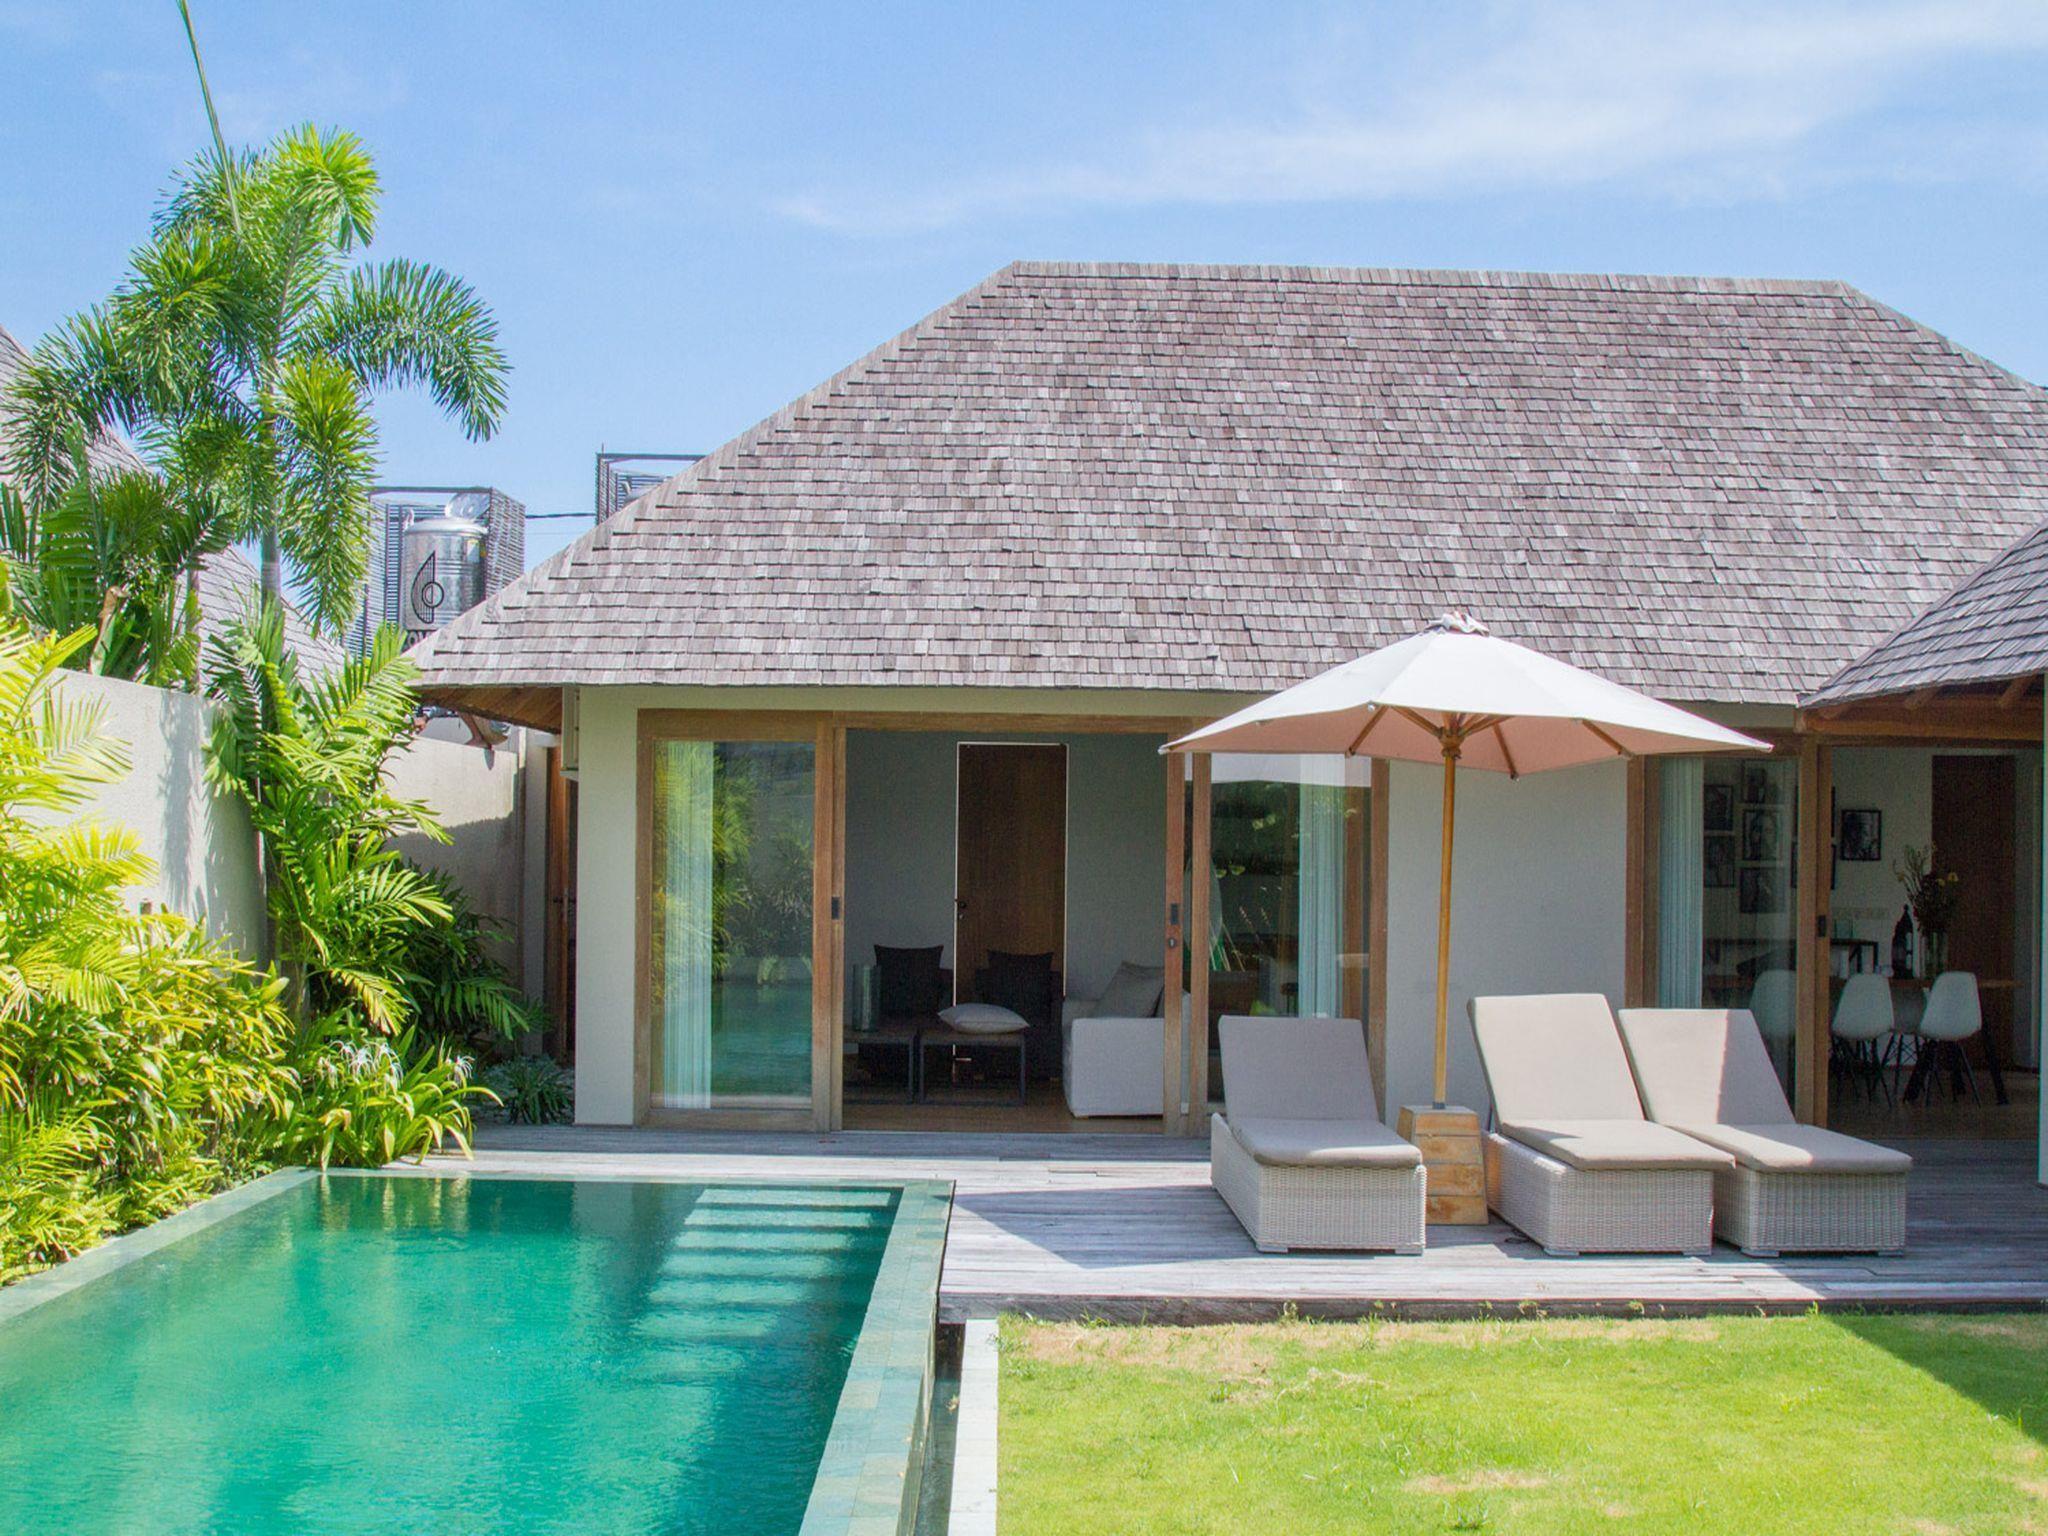 Bali villa zoyo indonesia asia with images bali house